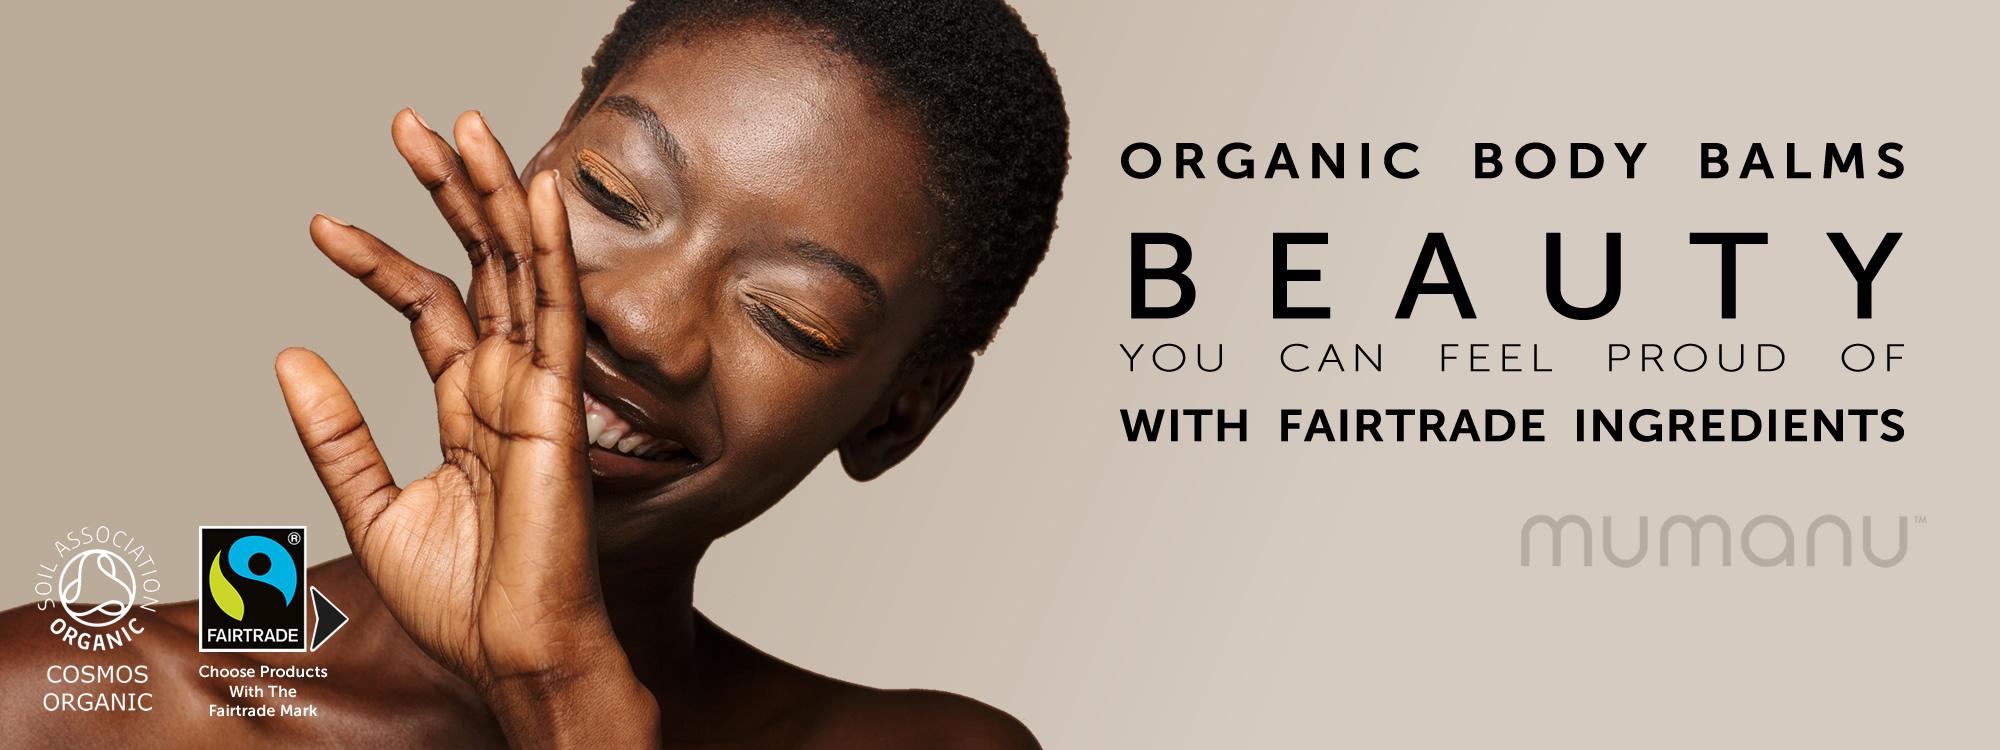 Ethical Skin Care - Mumanu Organic Massage & Body Balms With Fairtrade Ingredients